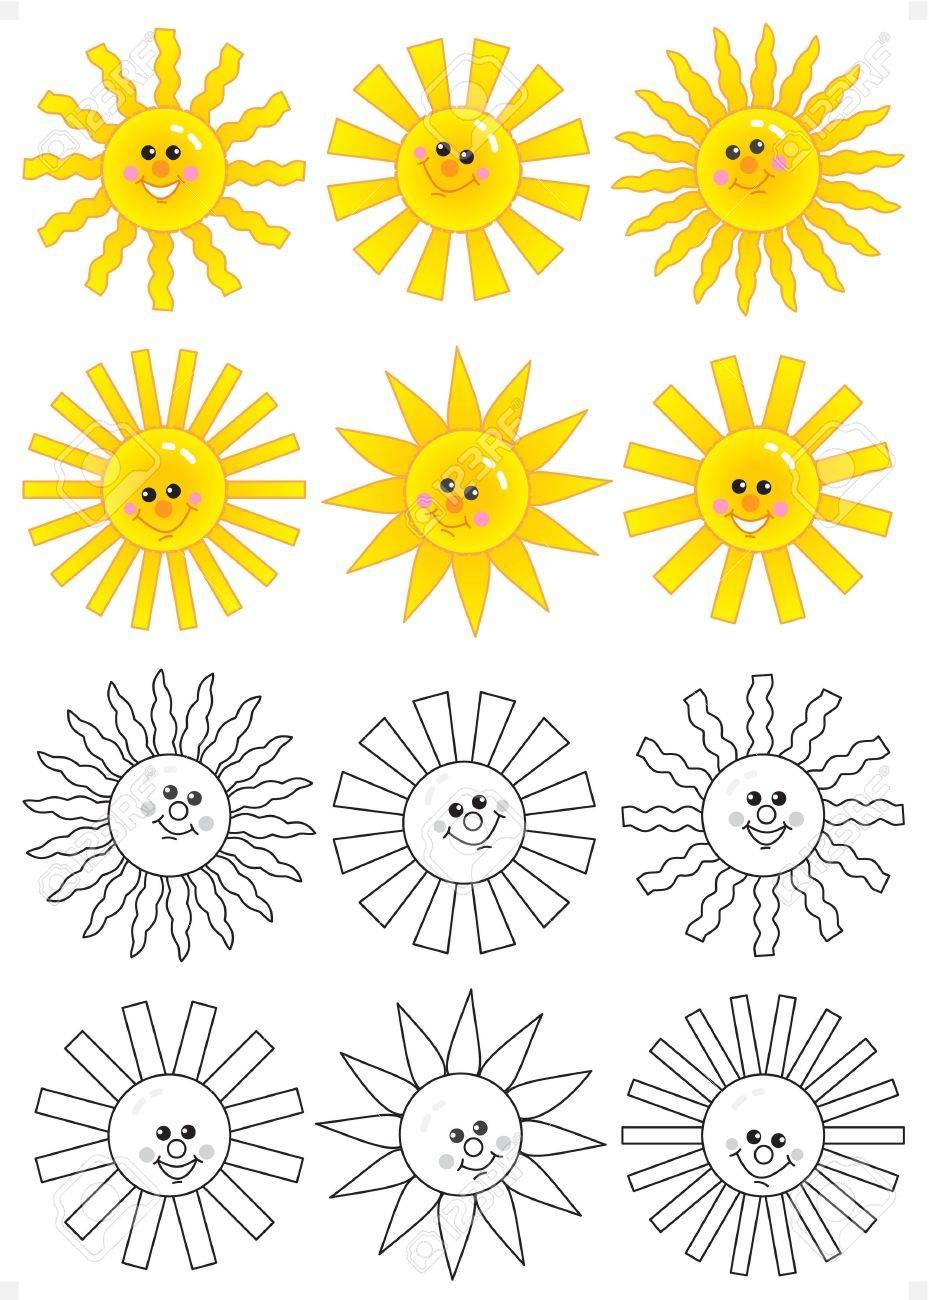 Cartoon Happy Face Black And White Set of Happy Cartoon Sun Faces